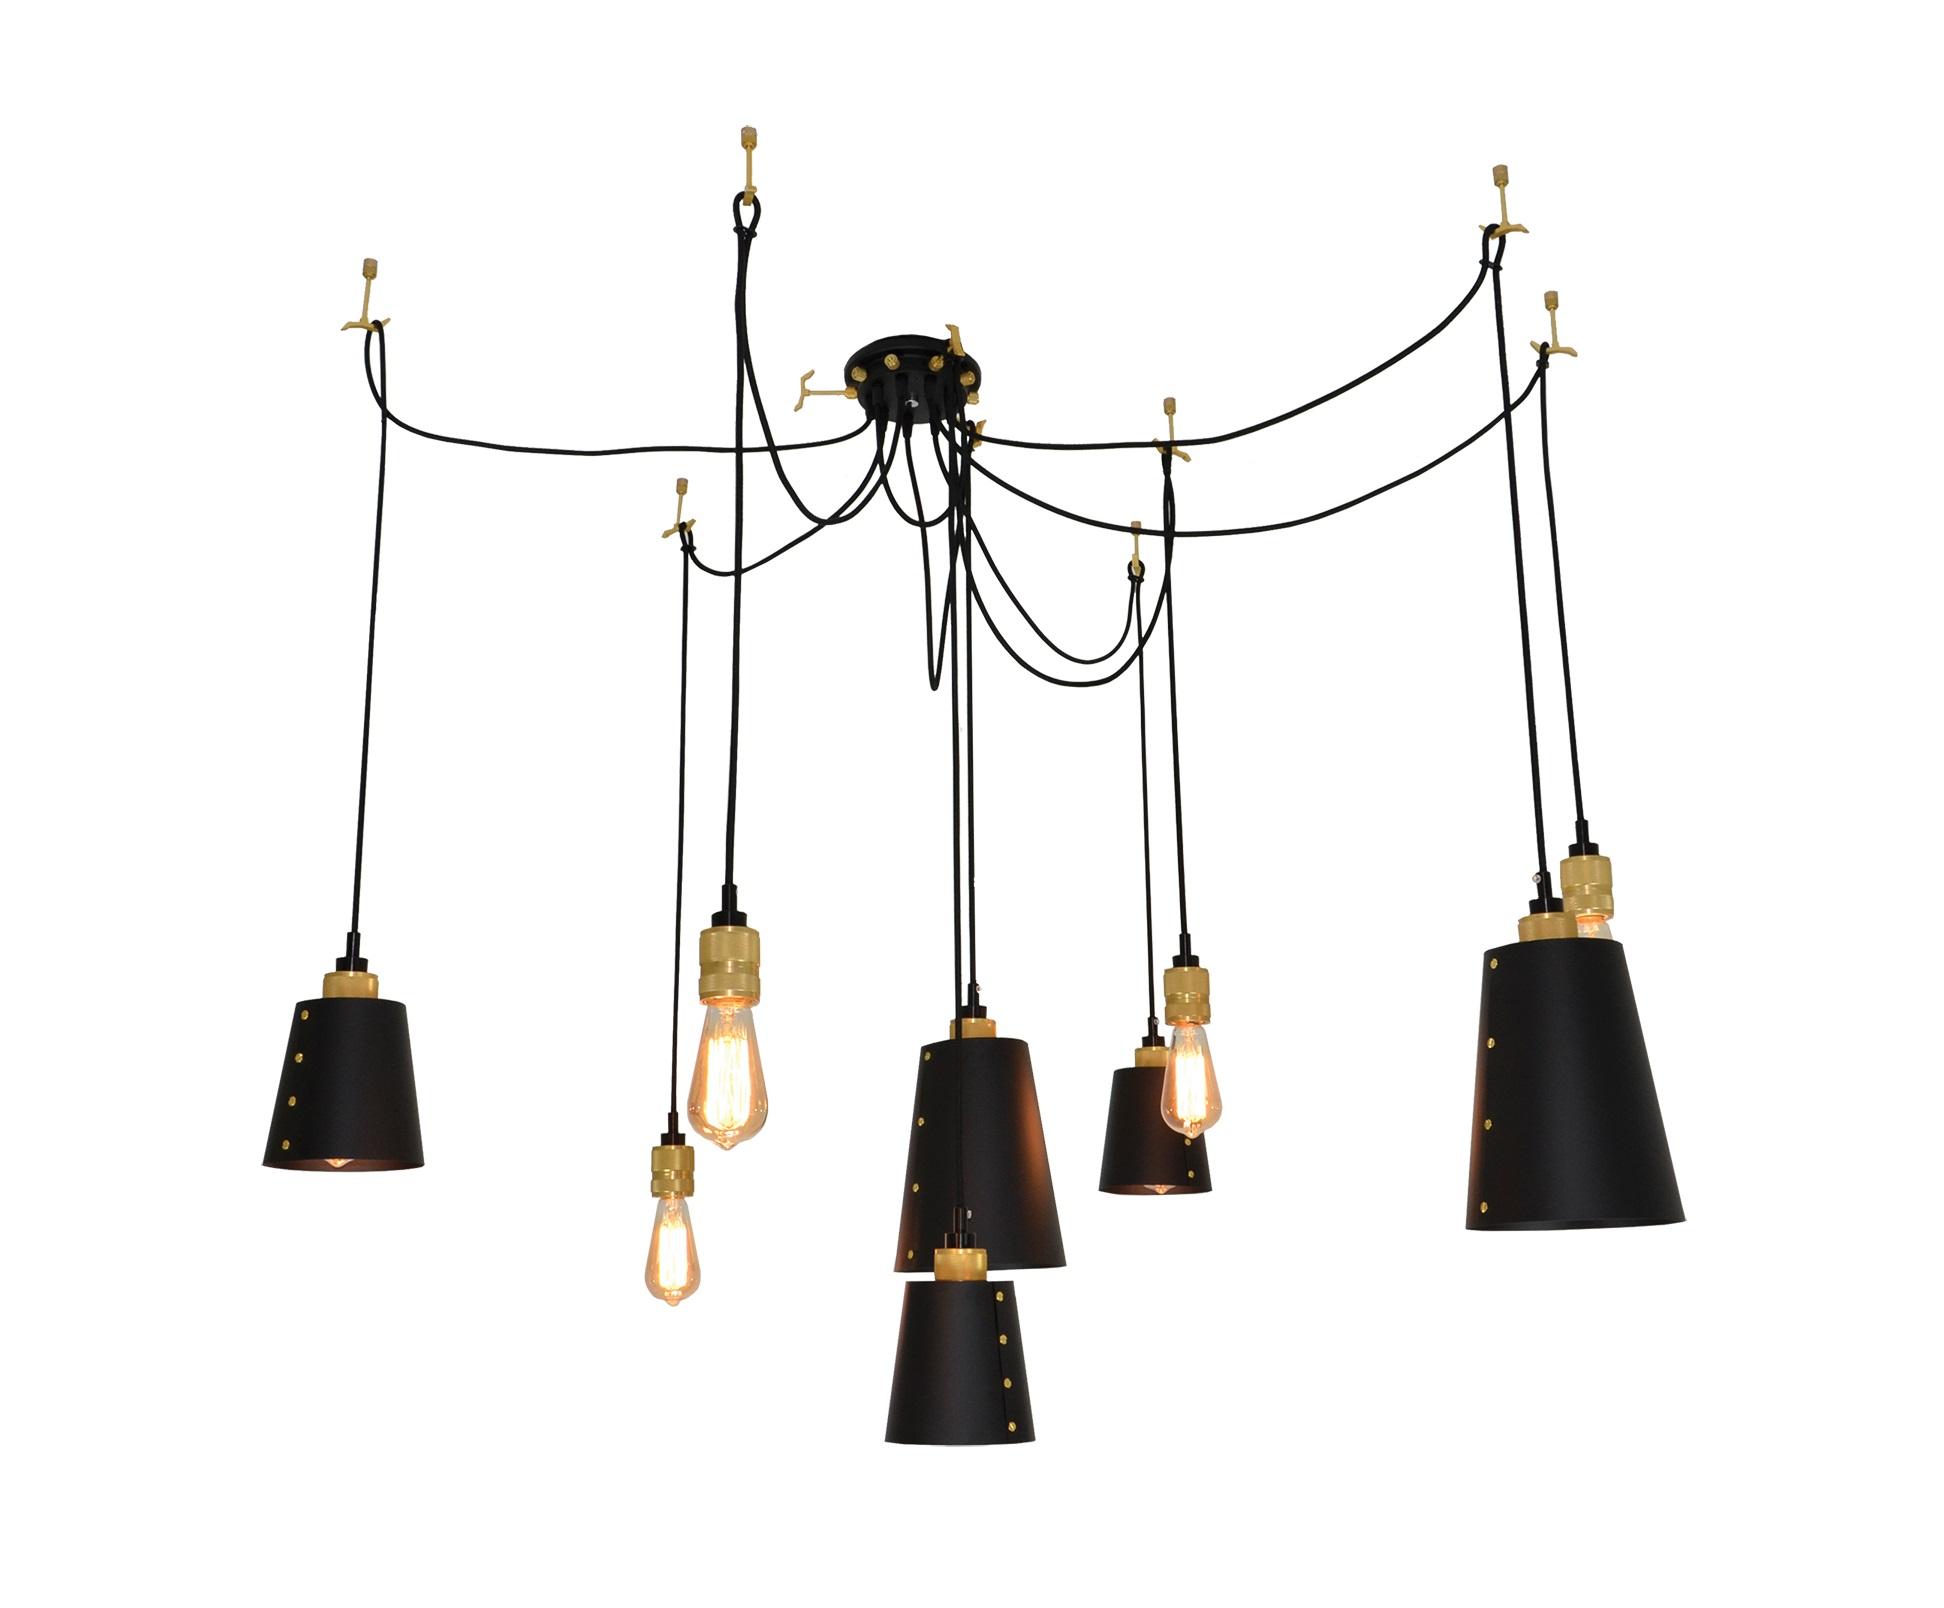 Подвесной светильникПодвесные светильники<br>&amp;lt;div&amp;gt;&amp;lt;div&amp;gt;Вид цоколя: E27&amp;lt;/div&amp;gt;&amp;lt;div&amp;gt;Мощность: 60W&amp;lt;/div&amp;gt;&amp;lt;div&amp;gt;Количество ламп: 9&amp;lt;/div&amp;gt;&amp;lt;div&amp;gt;Наличие ламп: отсутствуют.&amp;lt;/div&amp;gt;&amp;lt;/div&amp;gt;<br><br>Material: Металл<br>Width см: None<br>Height см: 140<br>Diameter см: 280